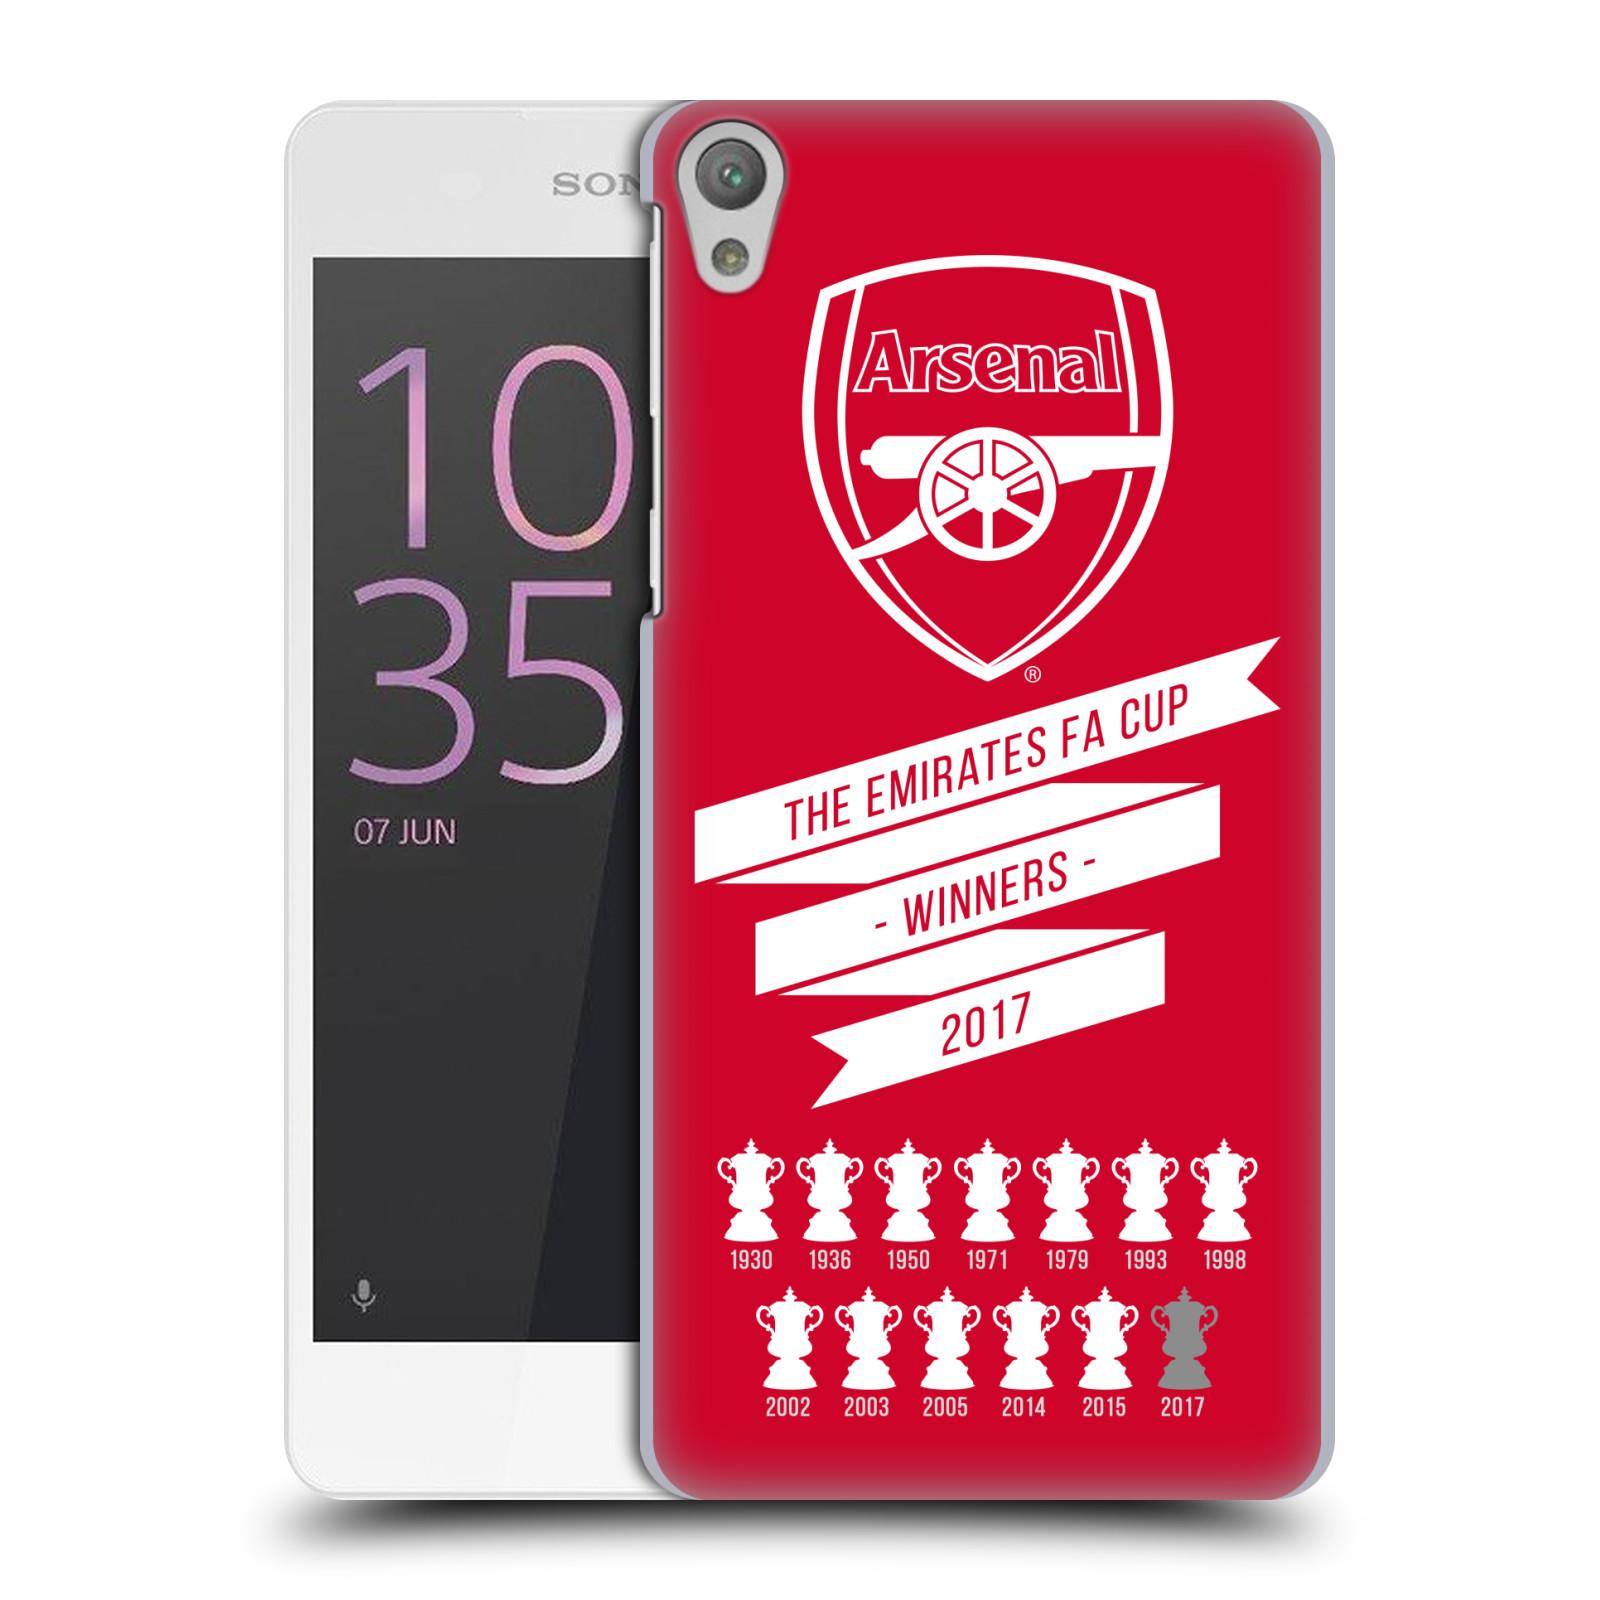 Plastové pouzdro na mobil Sony Xperia E5 - Head Case - Arsenal FC - 13 Wins